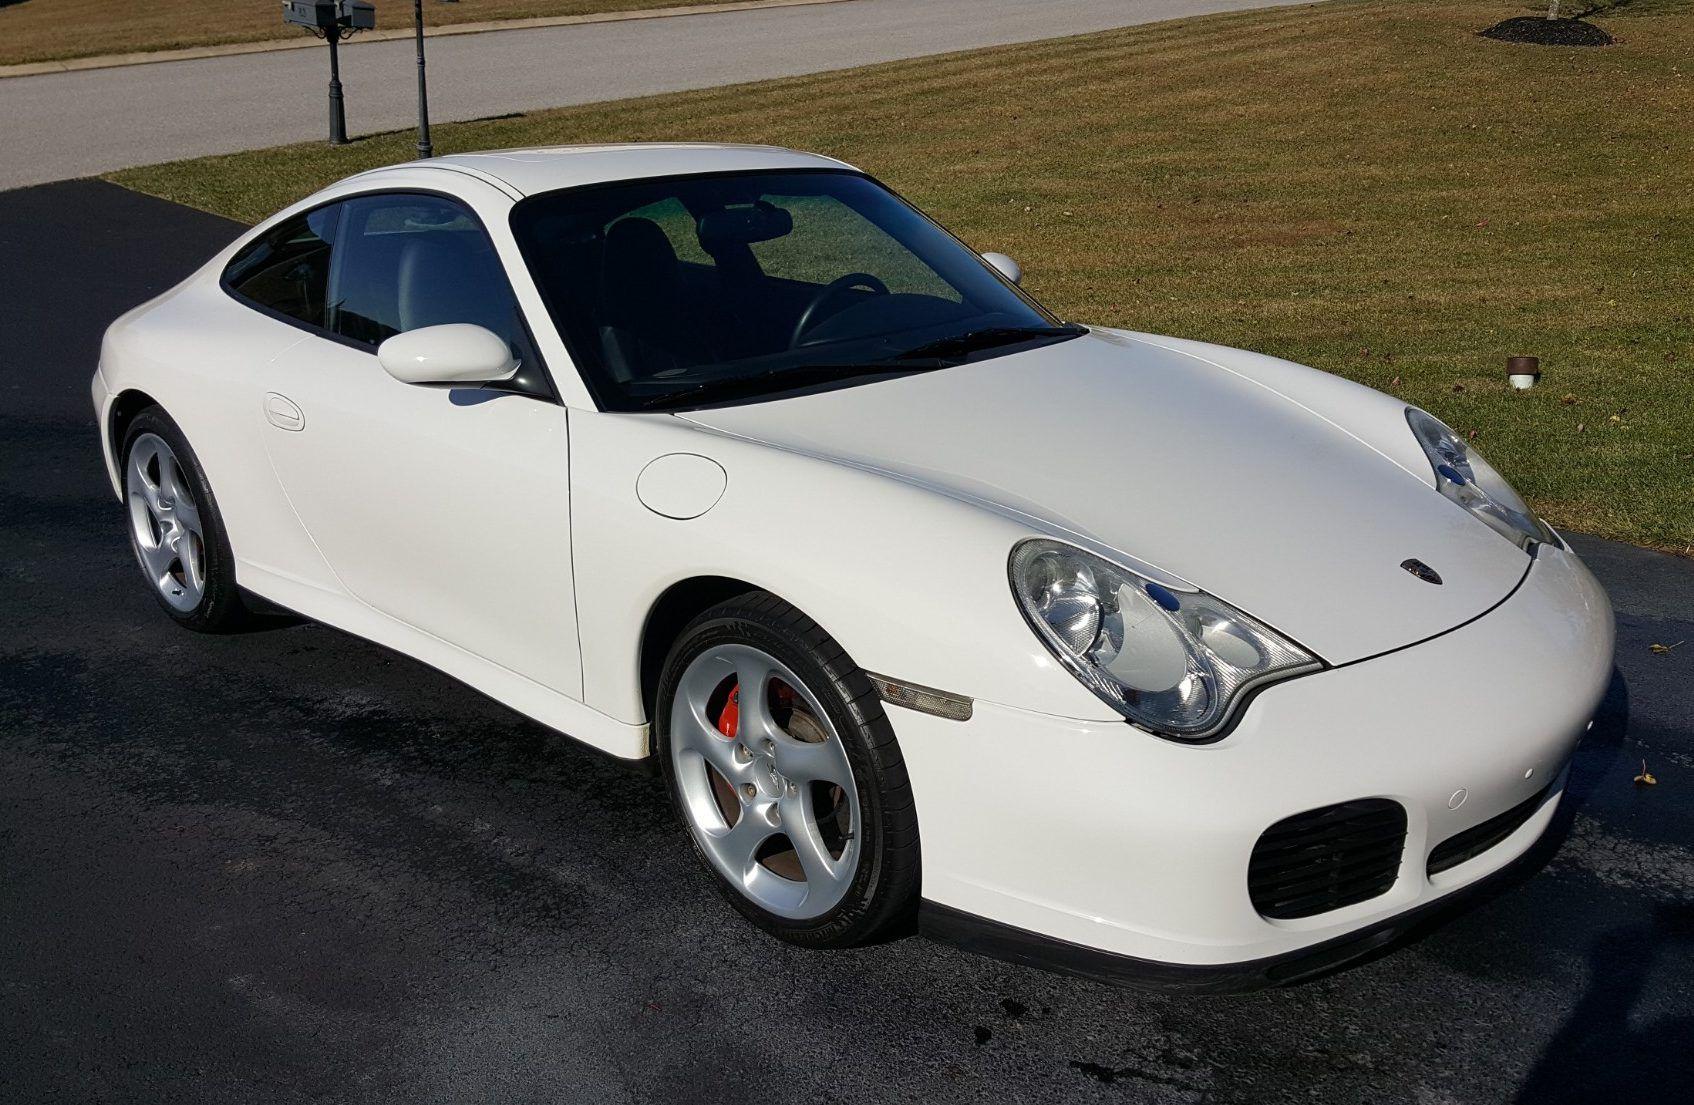 2004 Porsche 911 Carrera 4s 911 Carrera 4s Porsche 911 Carrera 4s Porsche 911